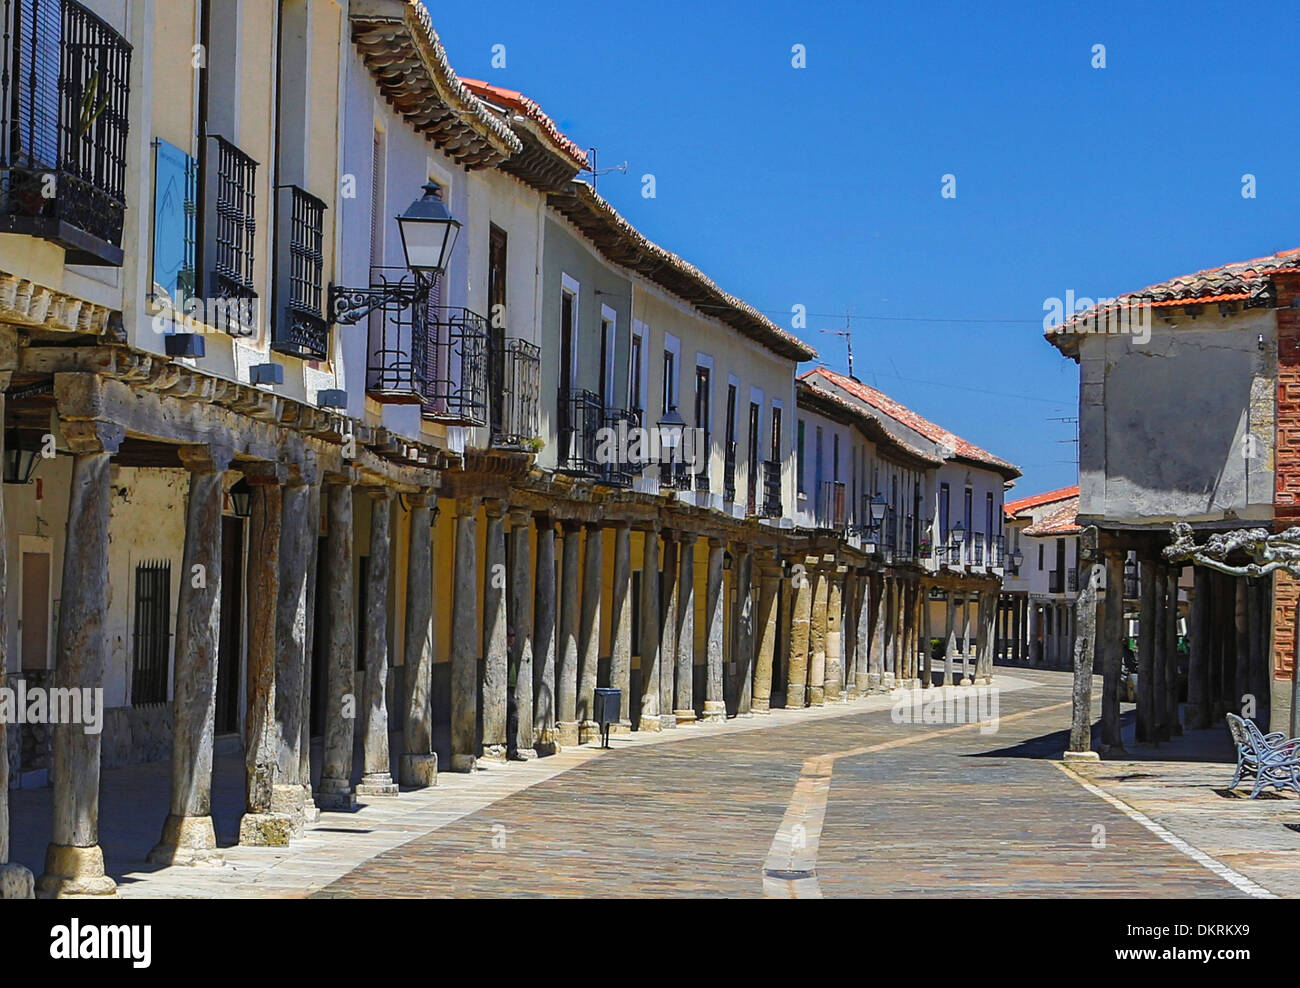 Ampudia Castilla Castile Leon Palencia Province architecture columns historical landscape old pueblo Spain Europe street - Stock Image